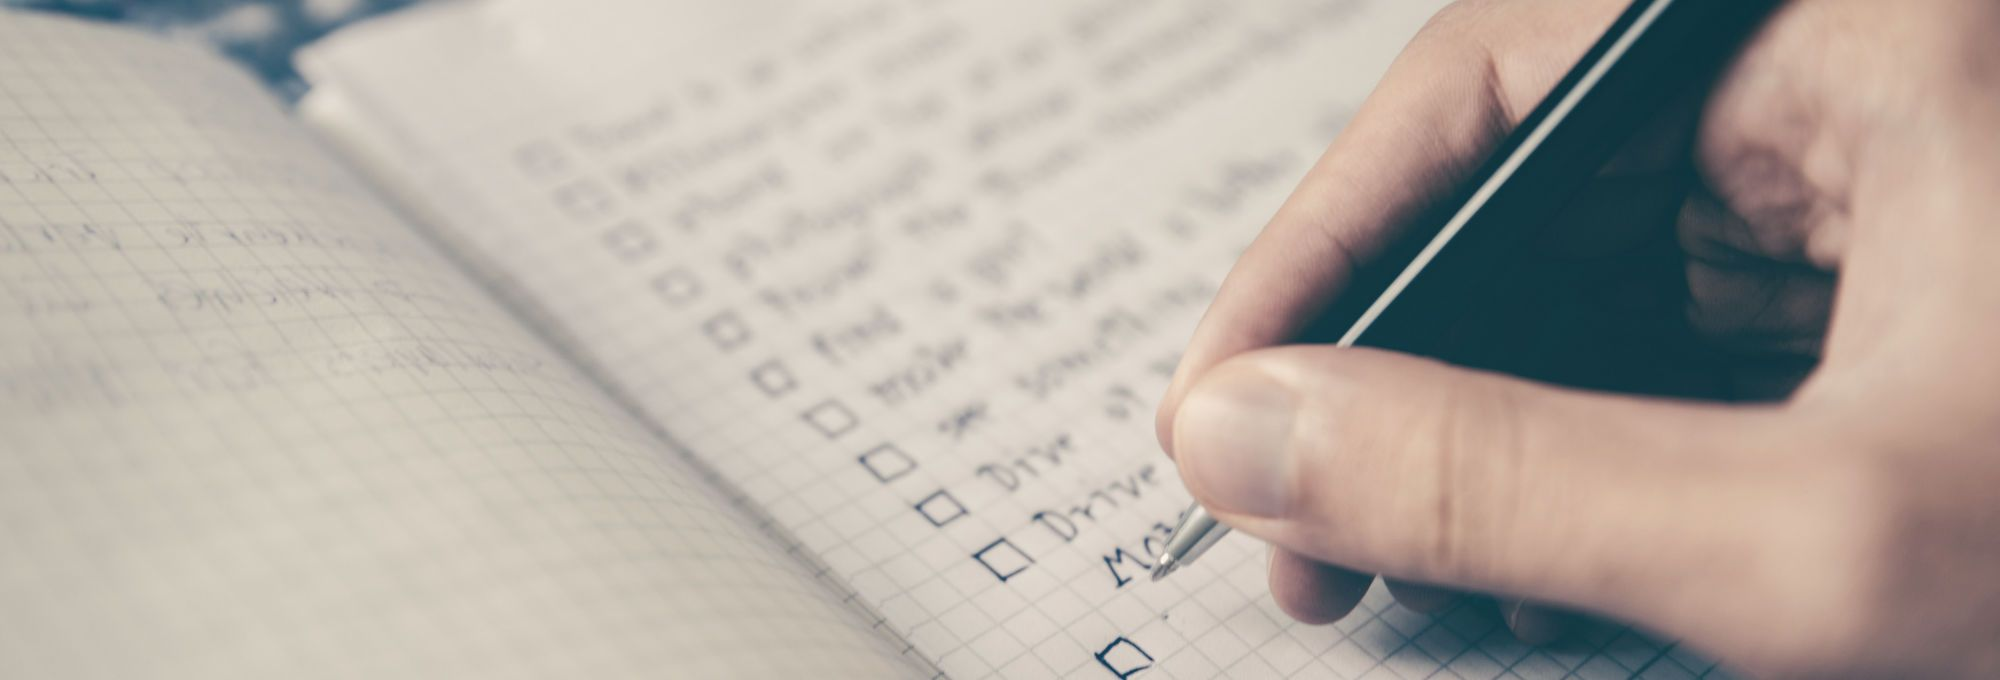 Symbolbild: Checkliste